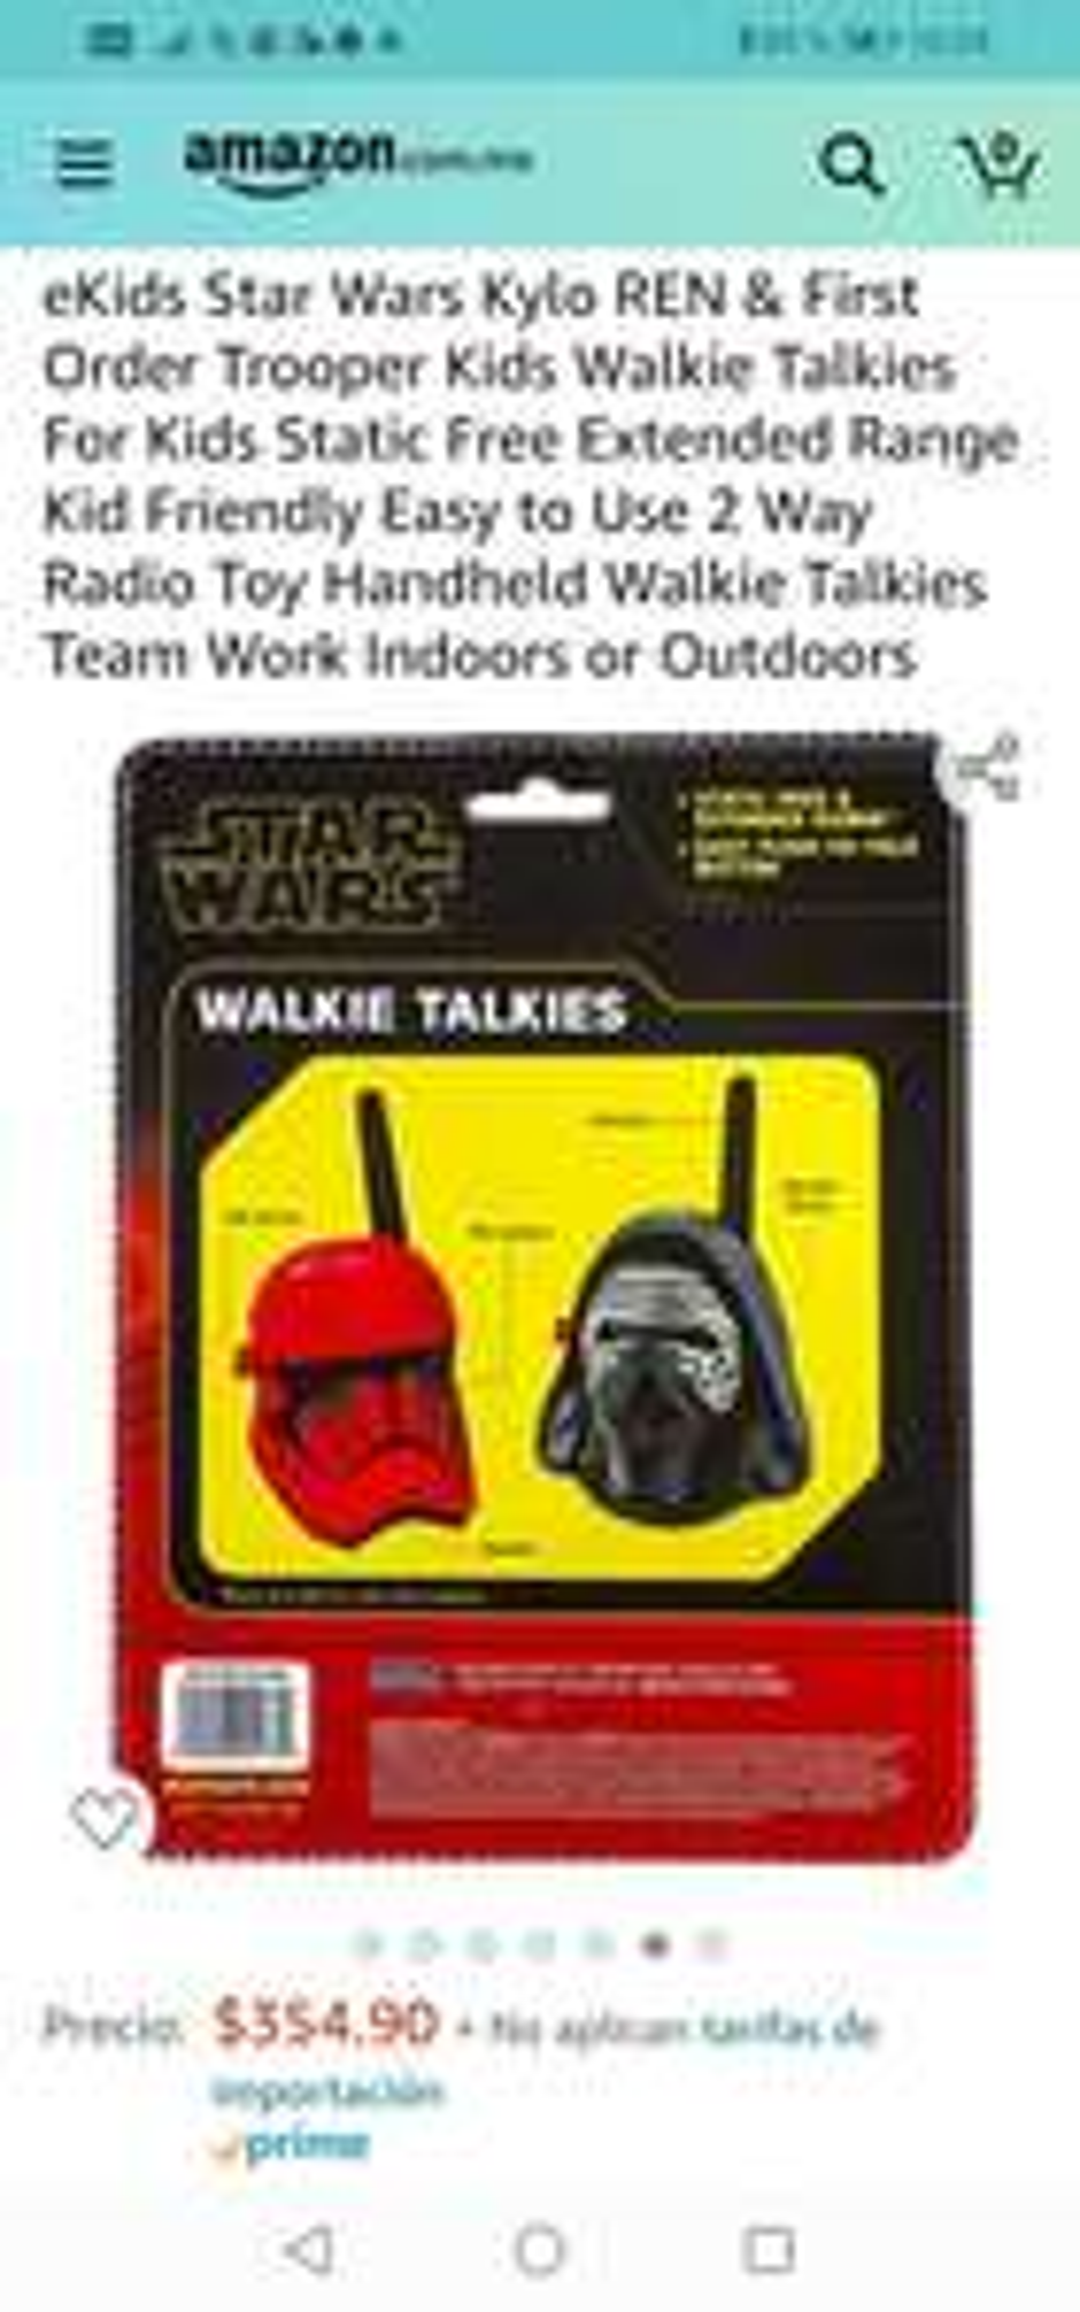 Amazon: Walkie Talkies For Kids Static Free Extended Range Kid Friendly Easy to Use 2 Way Radio Toy Handheld Walkie